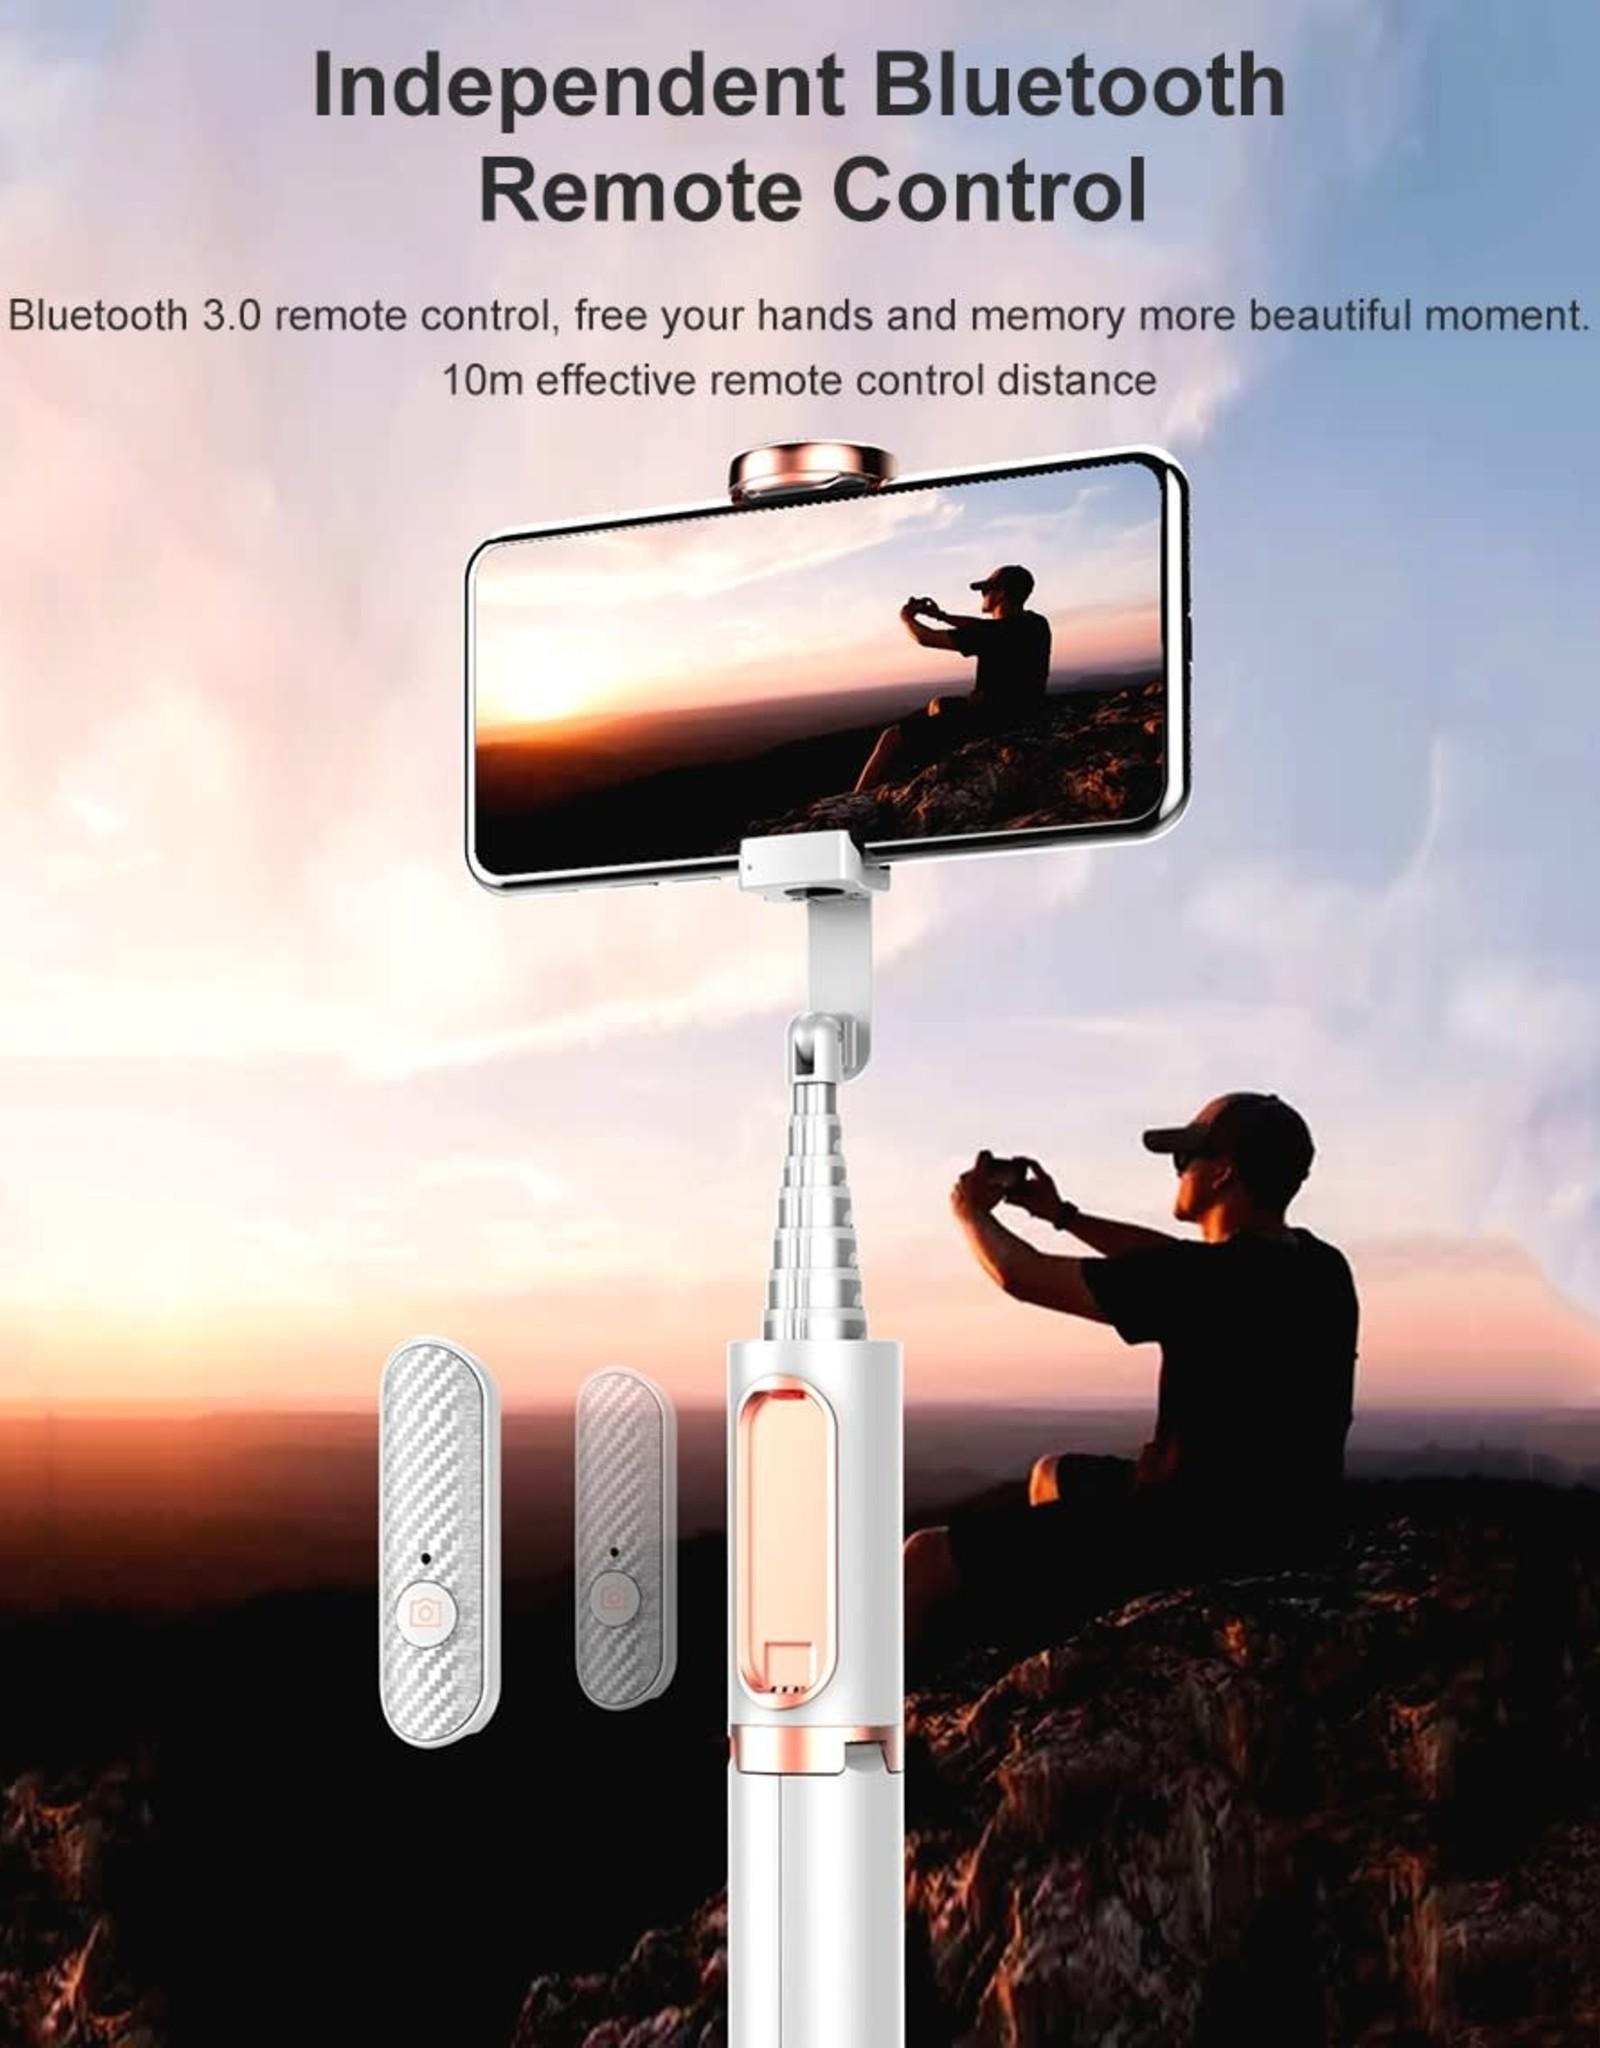 Joyroom Phantom Series Tripod BT Wireless Selfie JR- Oth-AB202